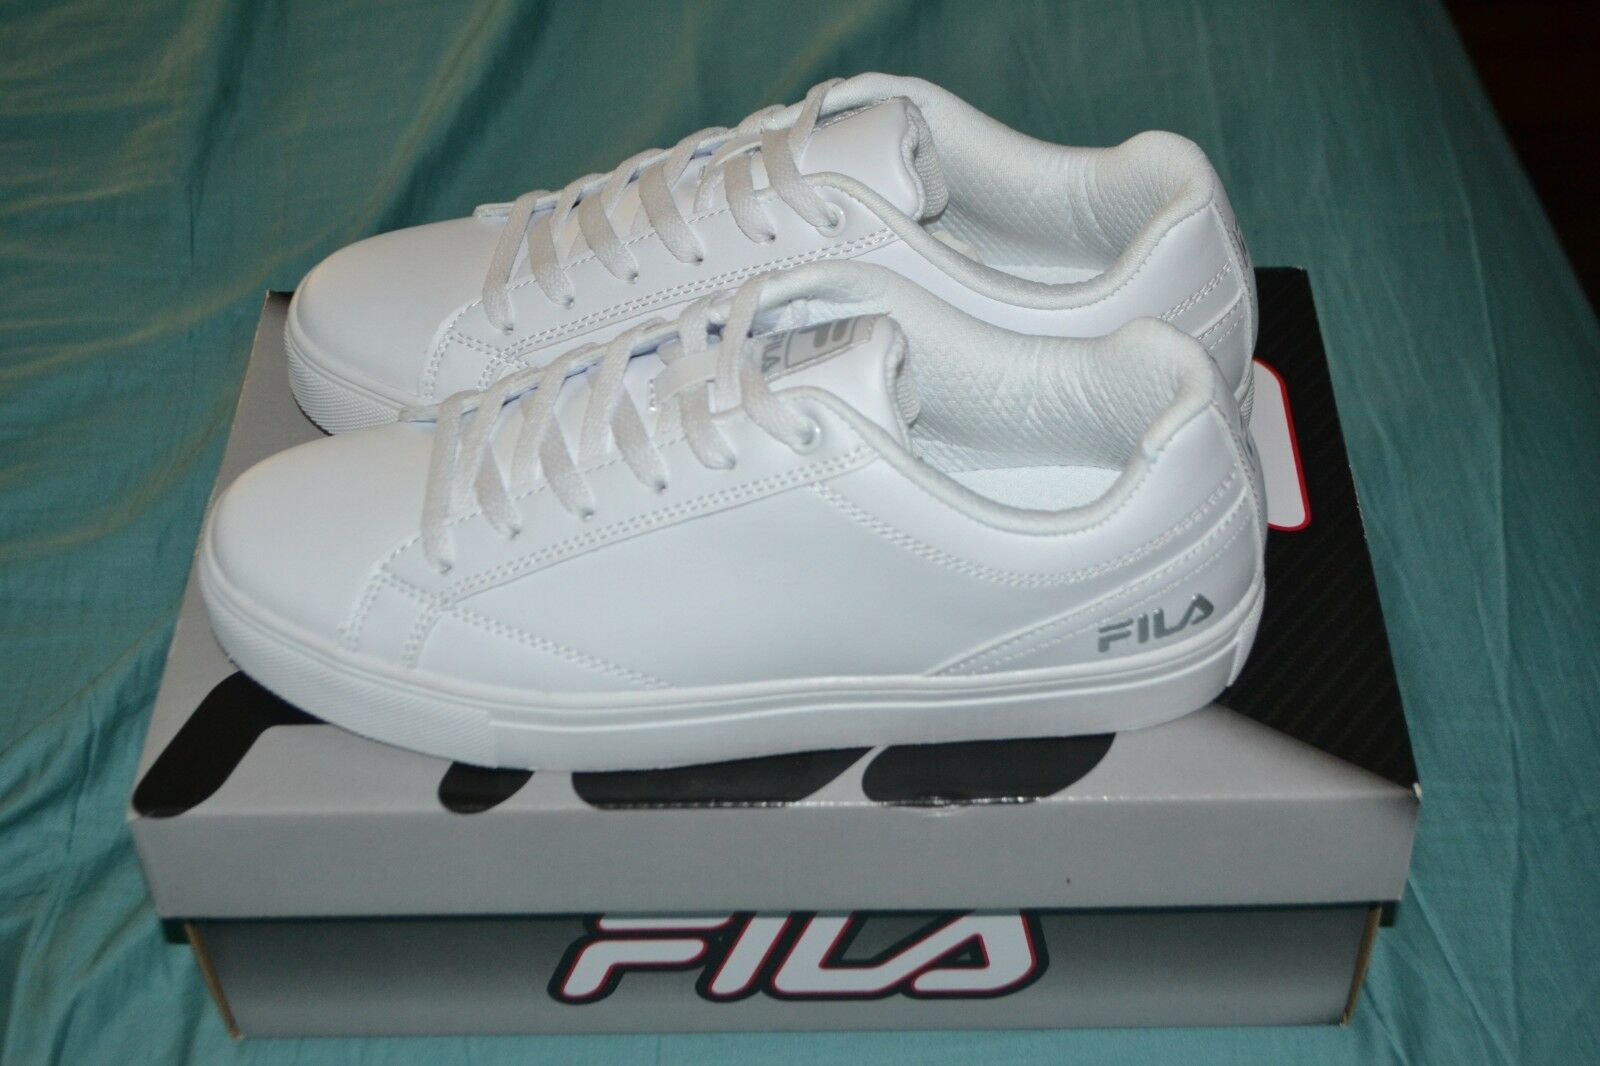 NEW Fila Women's Amalfi Walking shoes SZ SZ SZ 9 88f42a